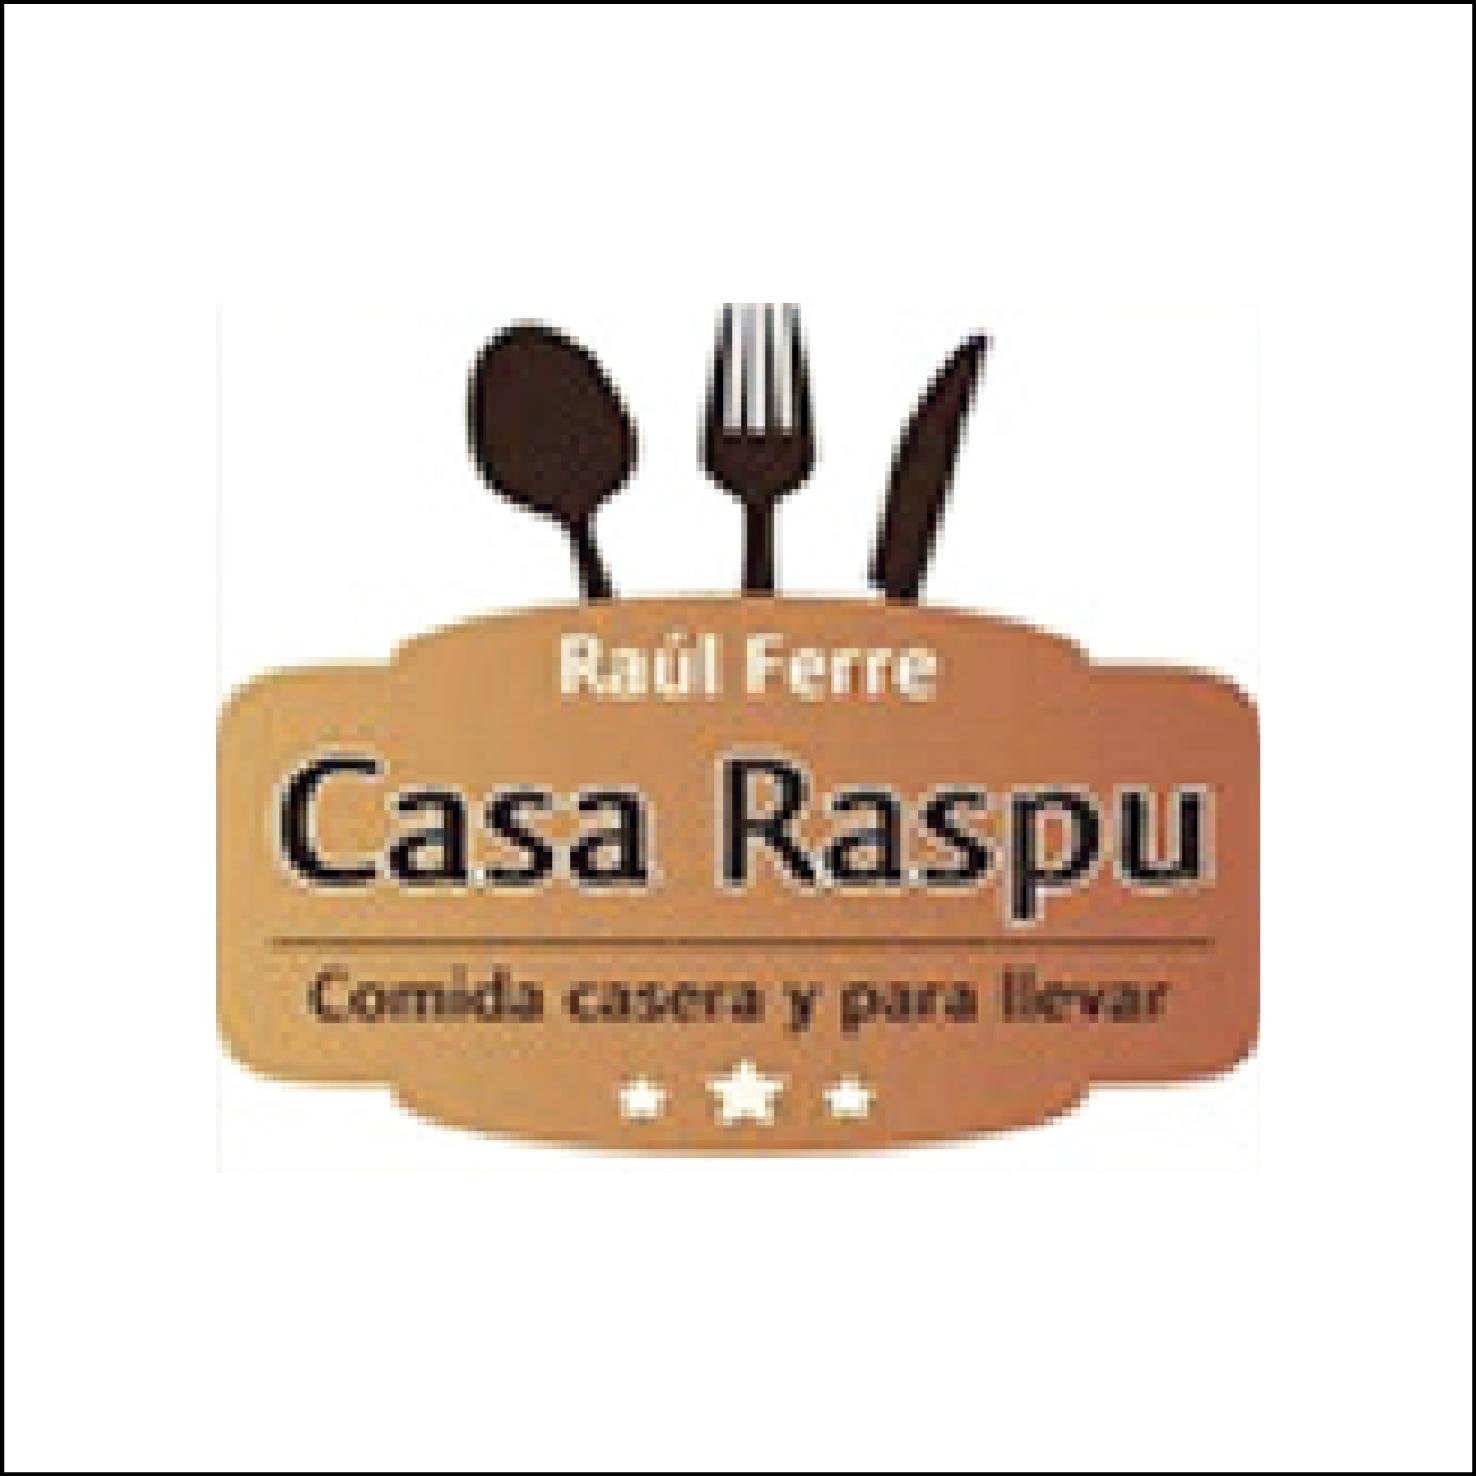 Carta de Raspu